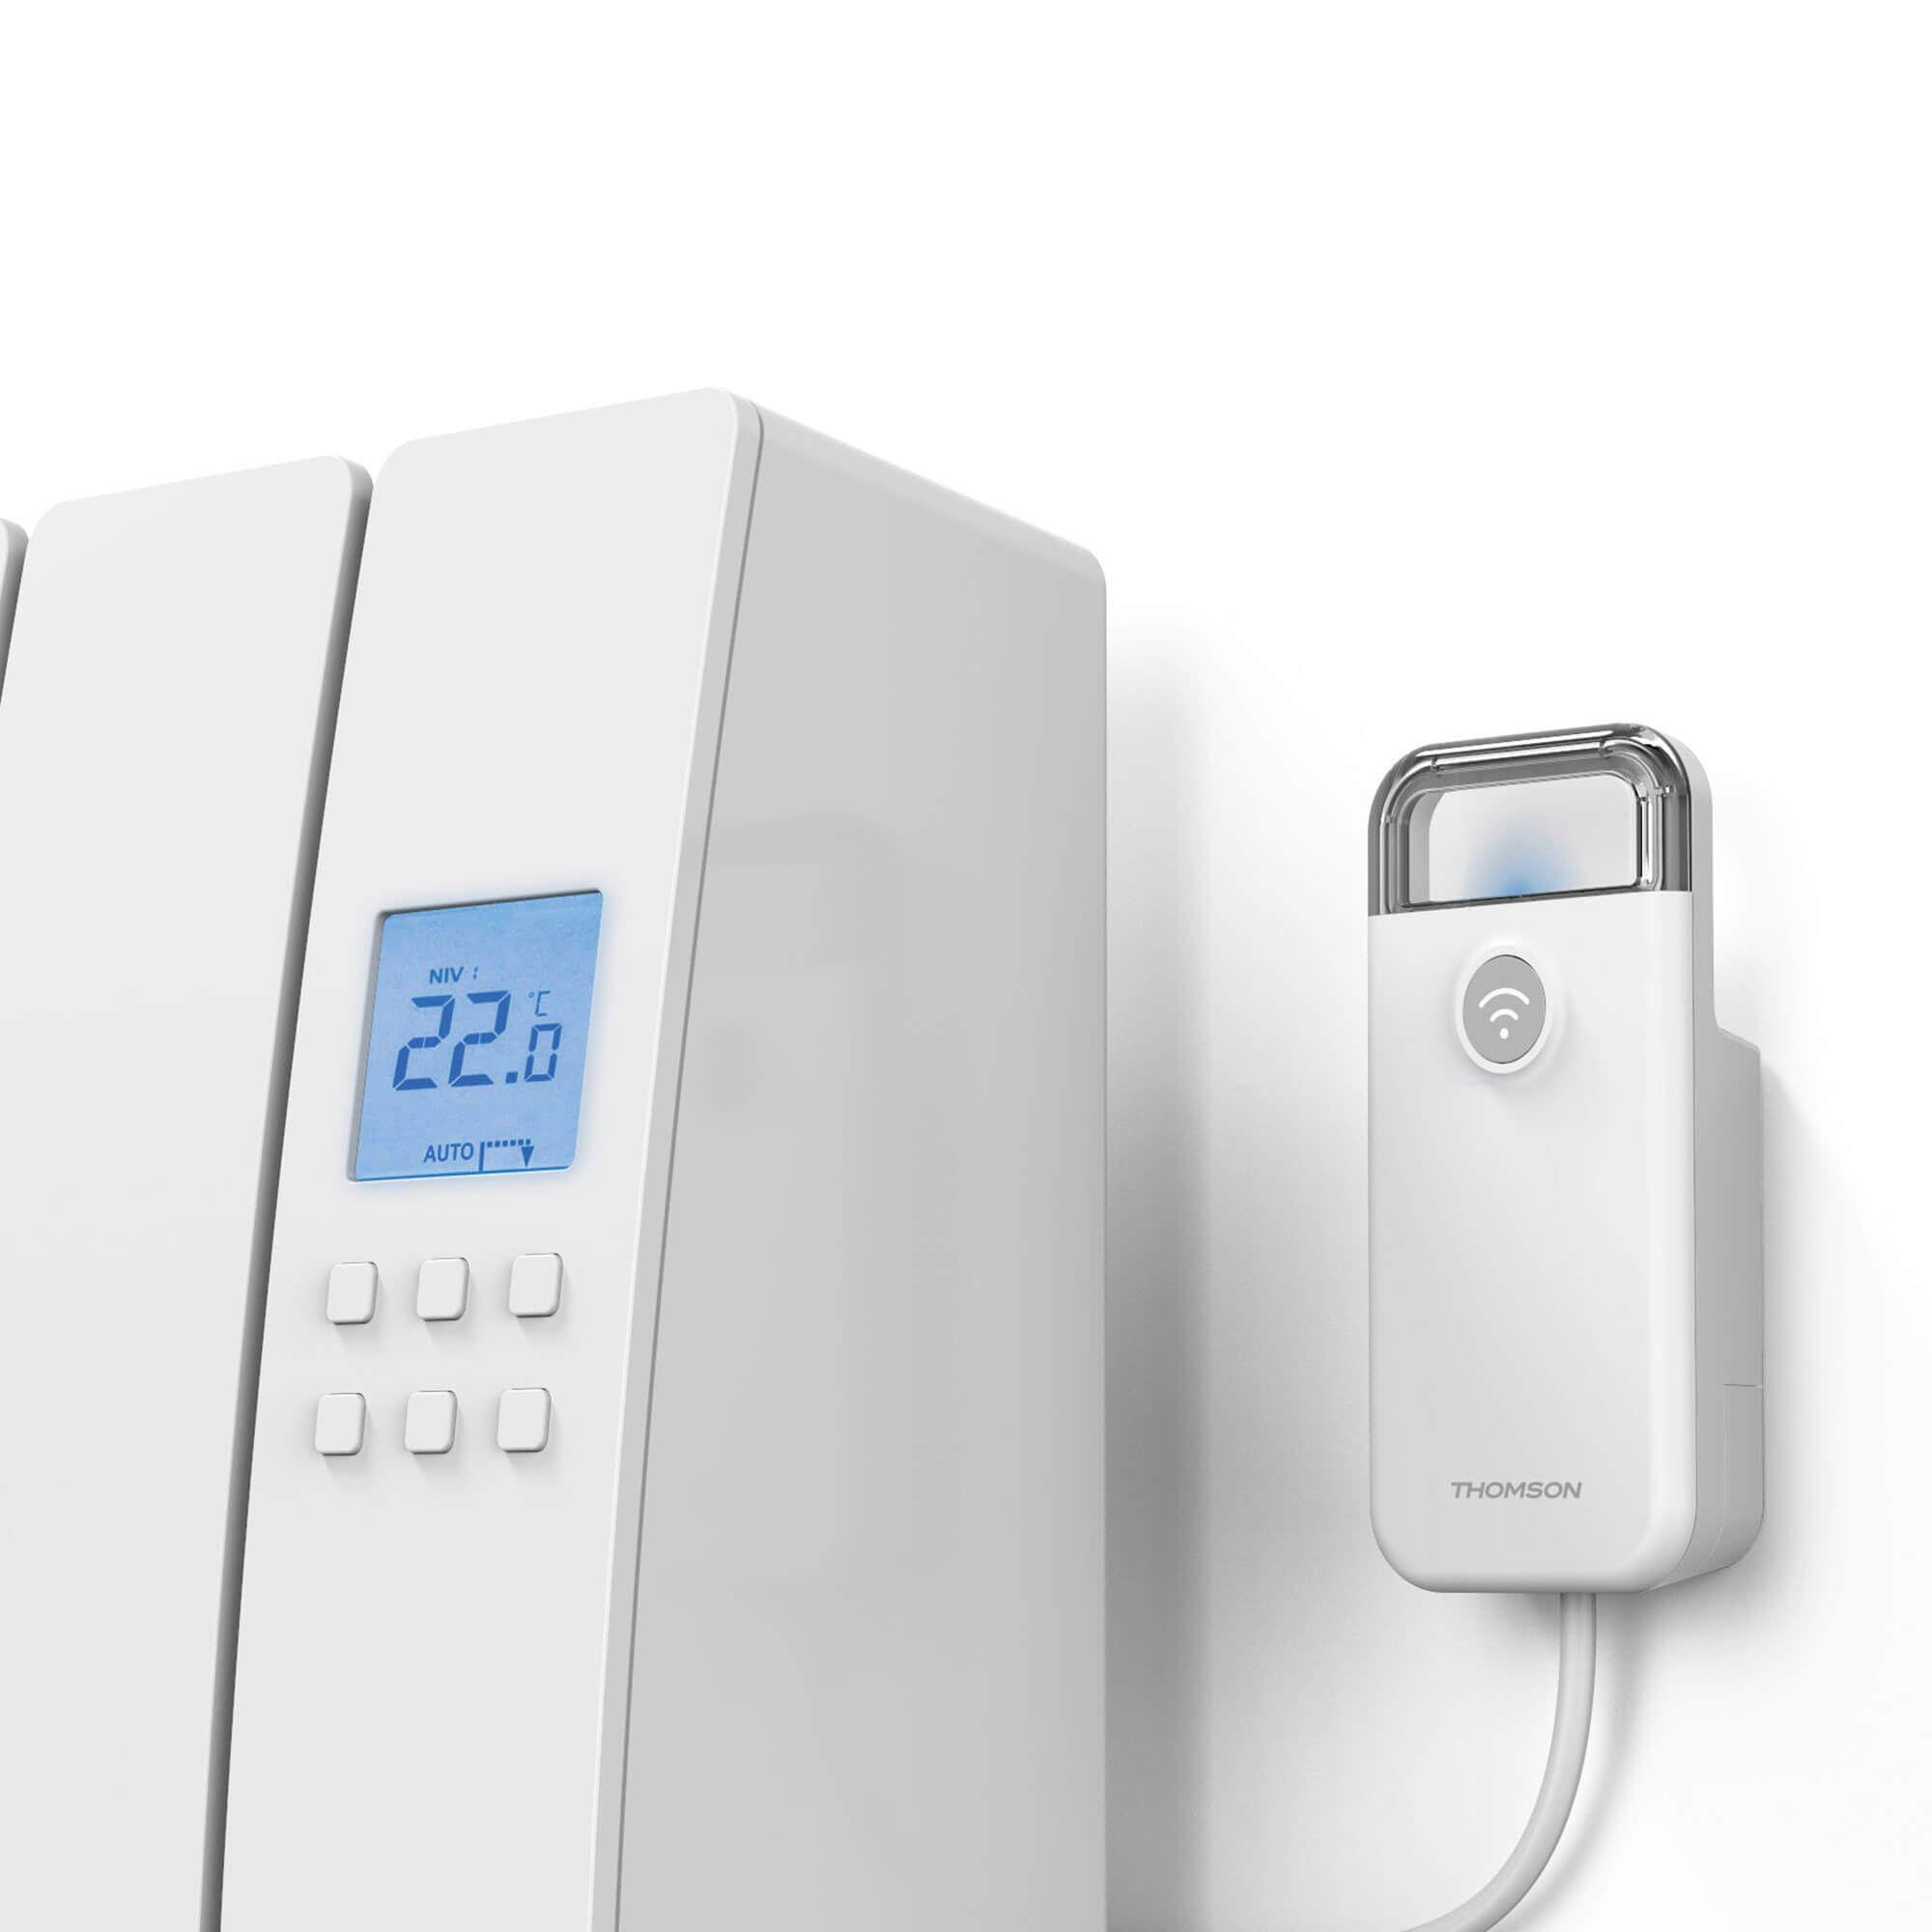 Module de chauffage Wifi pour radiateur ON/OFF (520001)